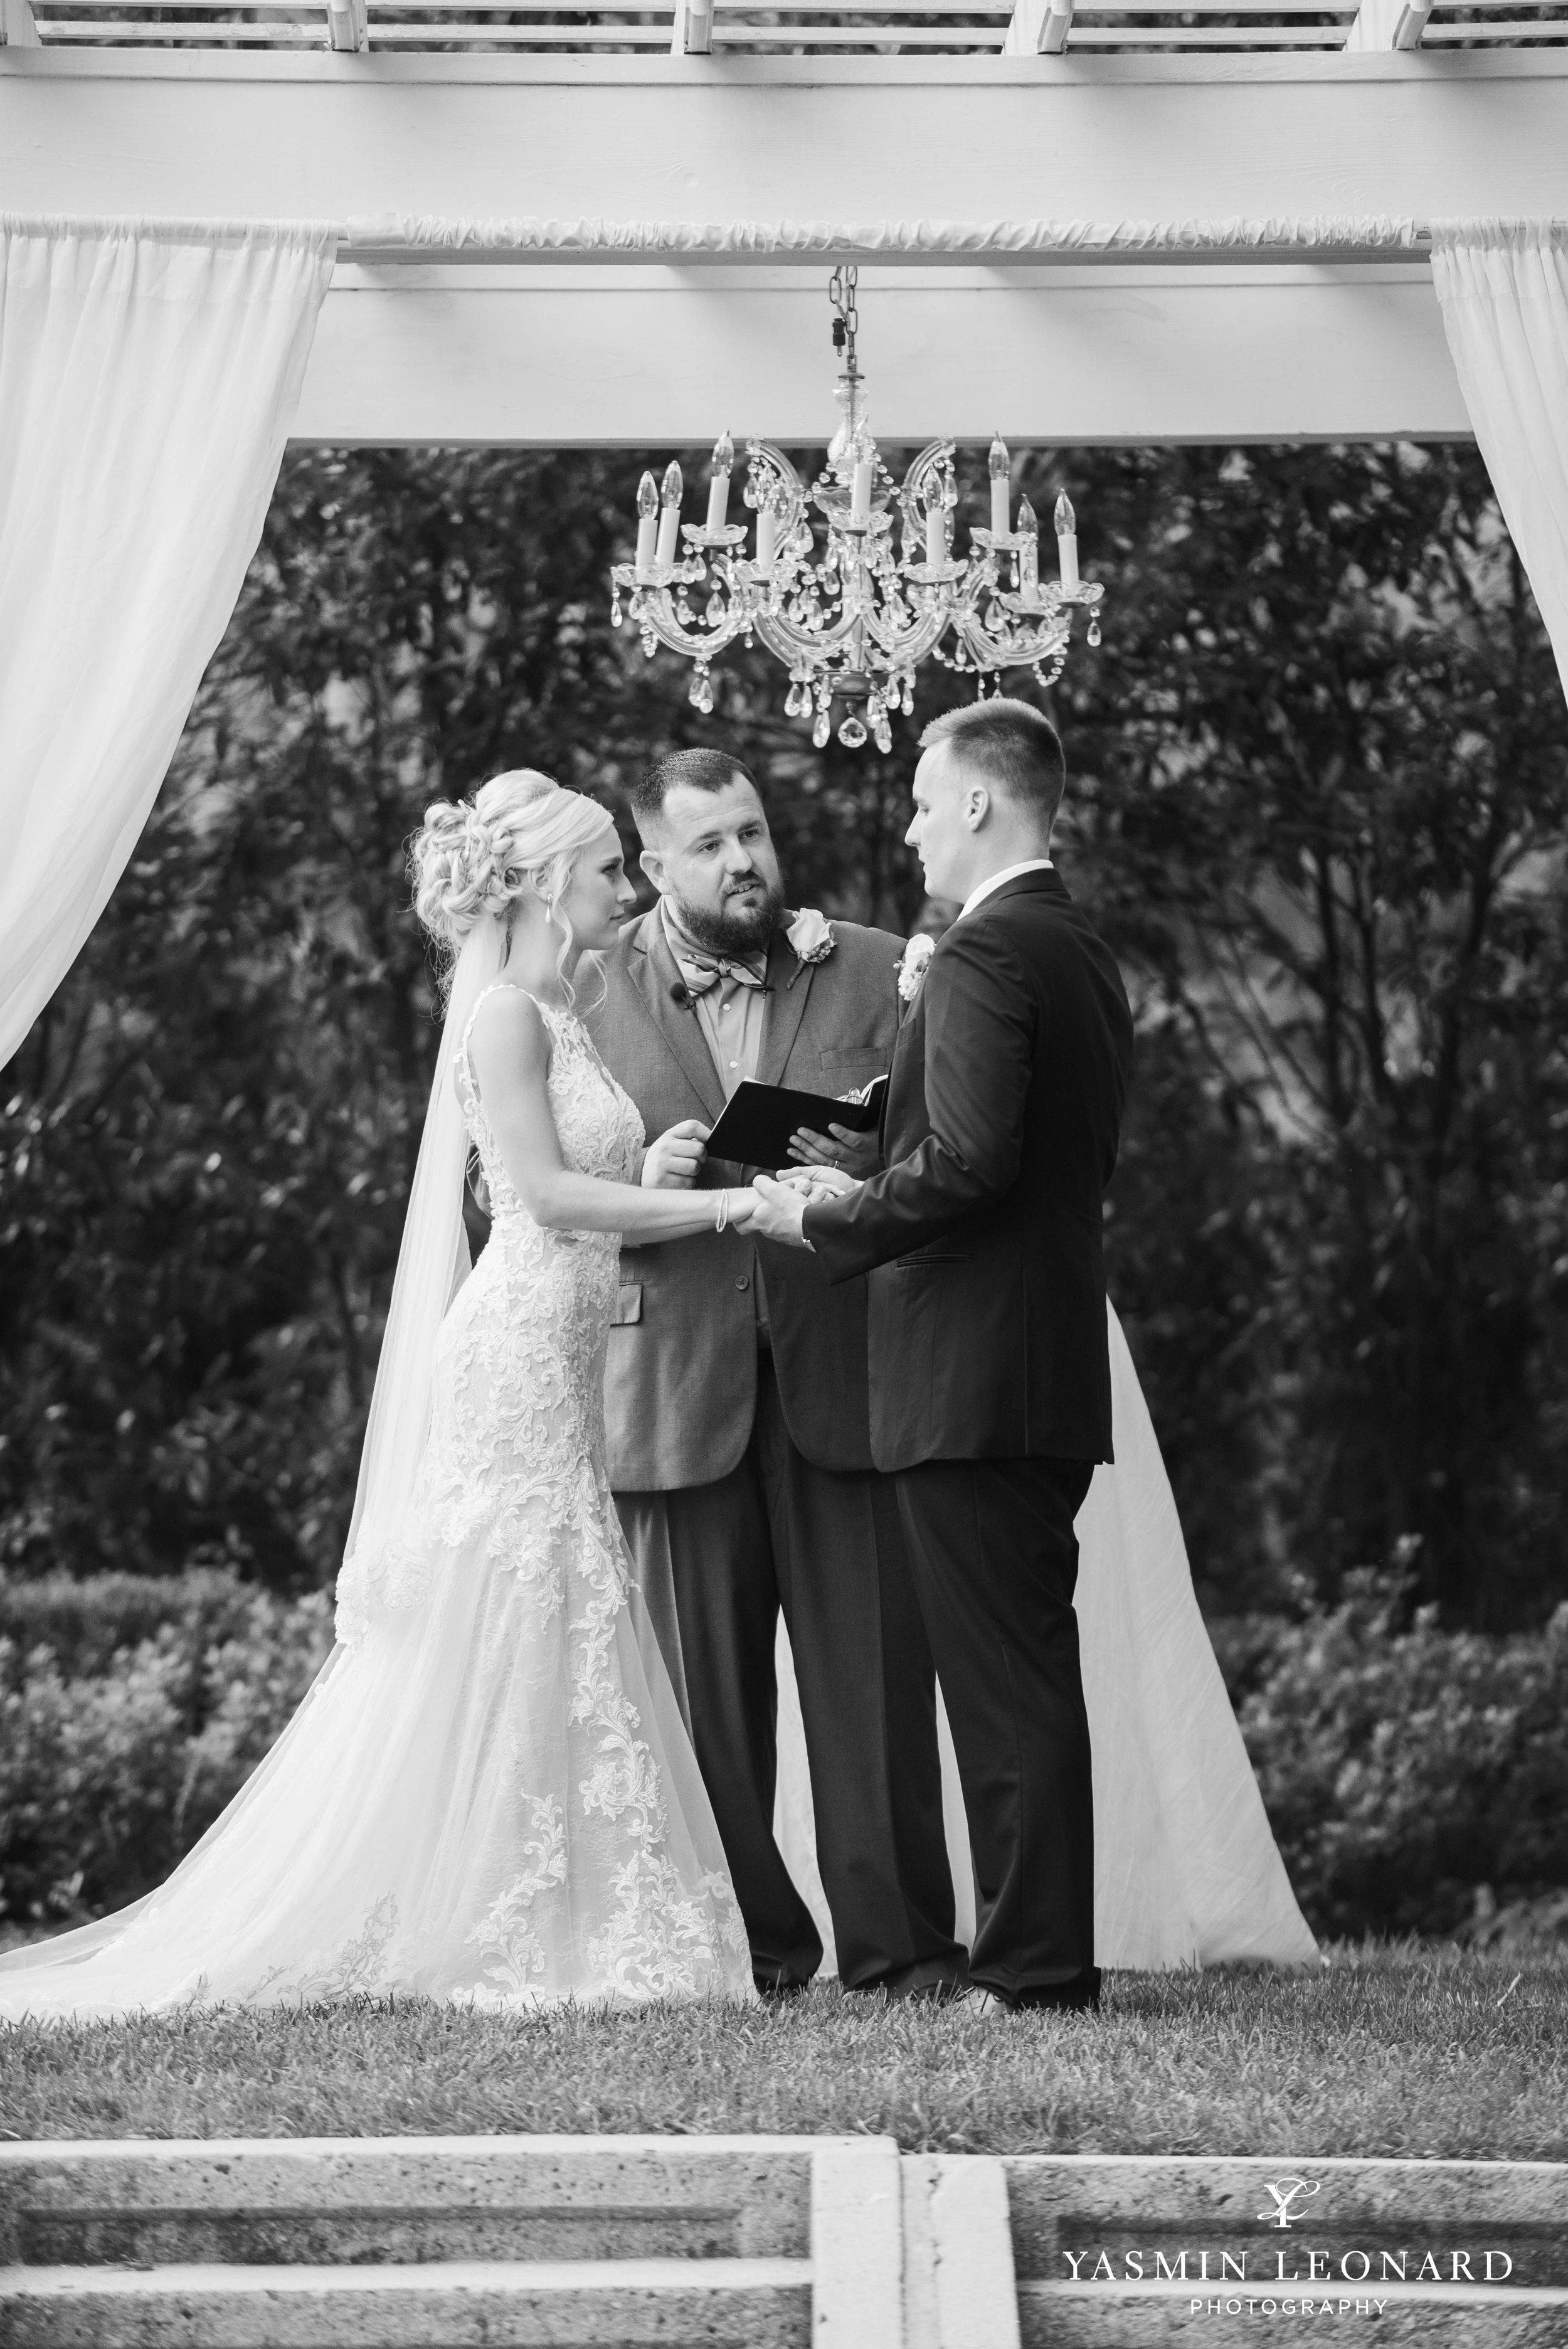 Separk Mansion - NC Weddings - Gastonia Wedding - NC Wedding Venues - Pink and Blue Wedding Ideas - Pink Bridesmaid Dresses - Yasmin Leonard Photography-23.jpg